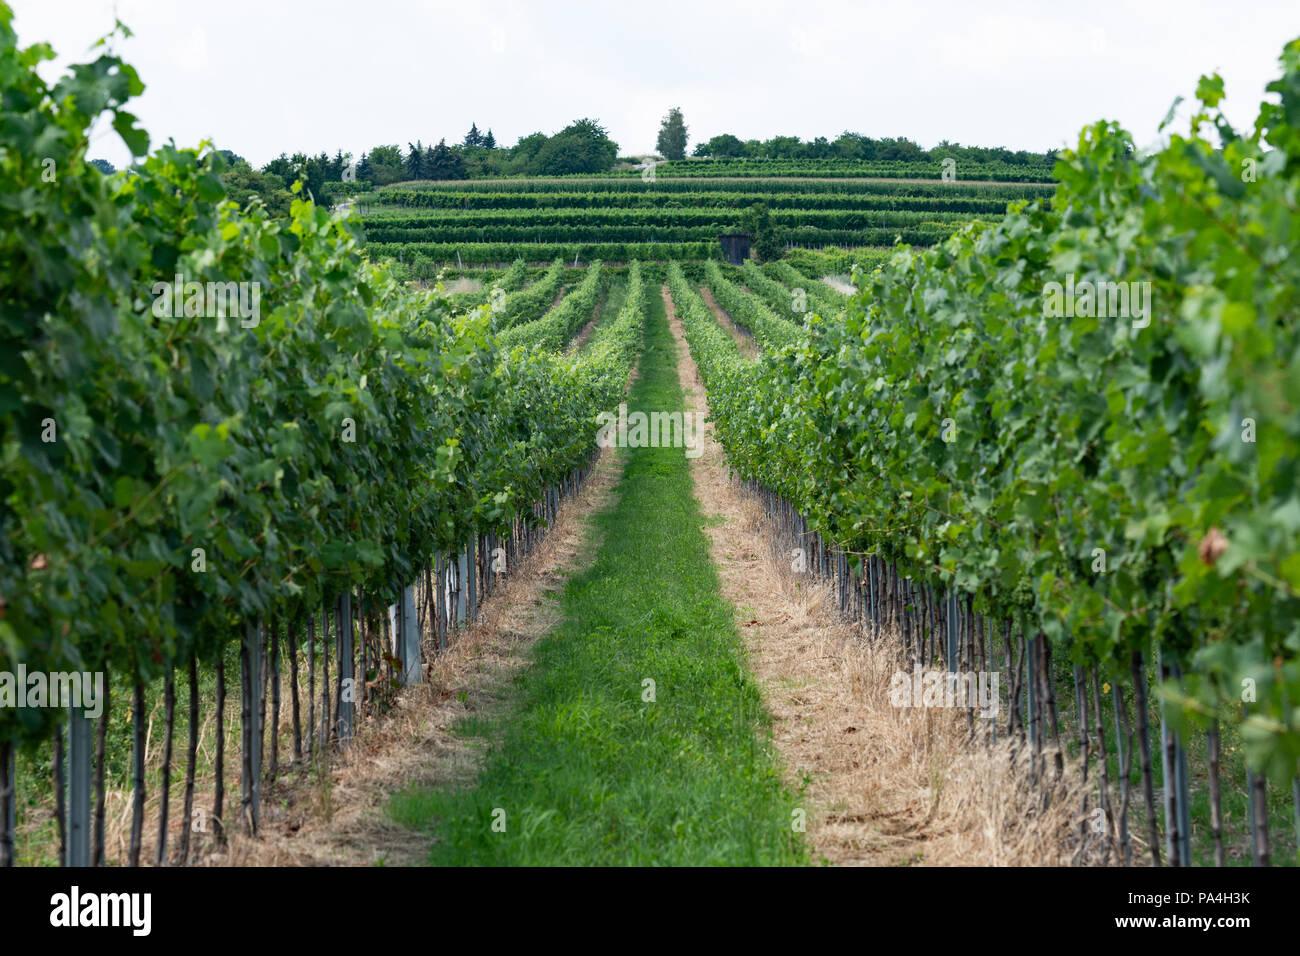 viticulture at Furth-Palt, Lower Austria, Austria Stock Photo